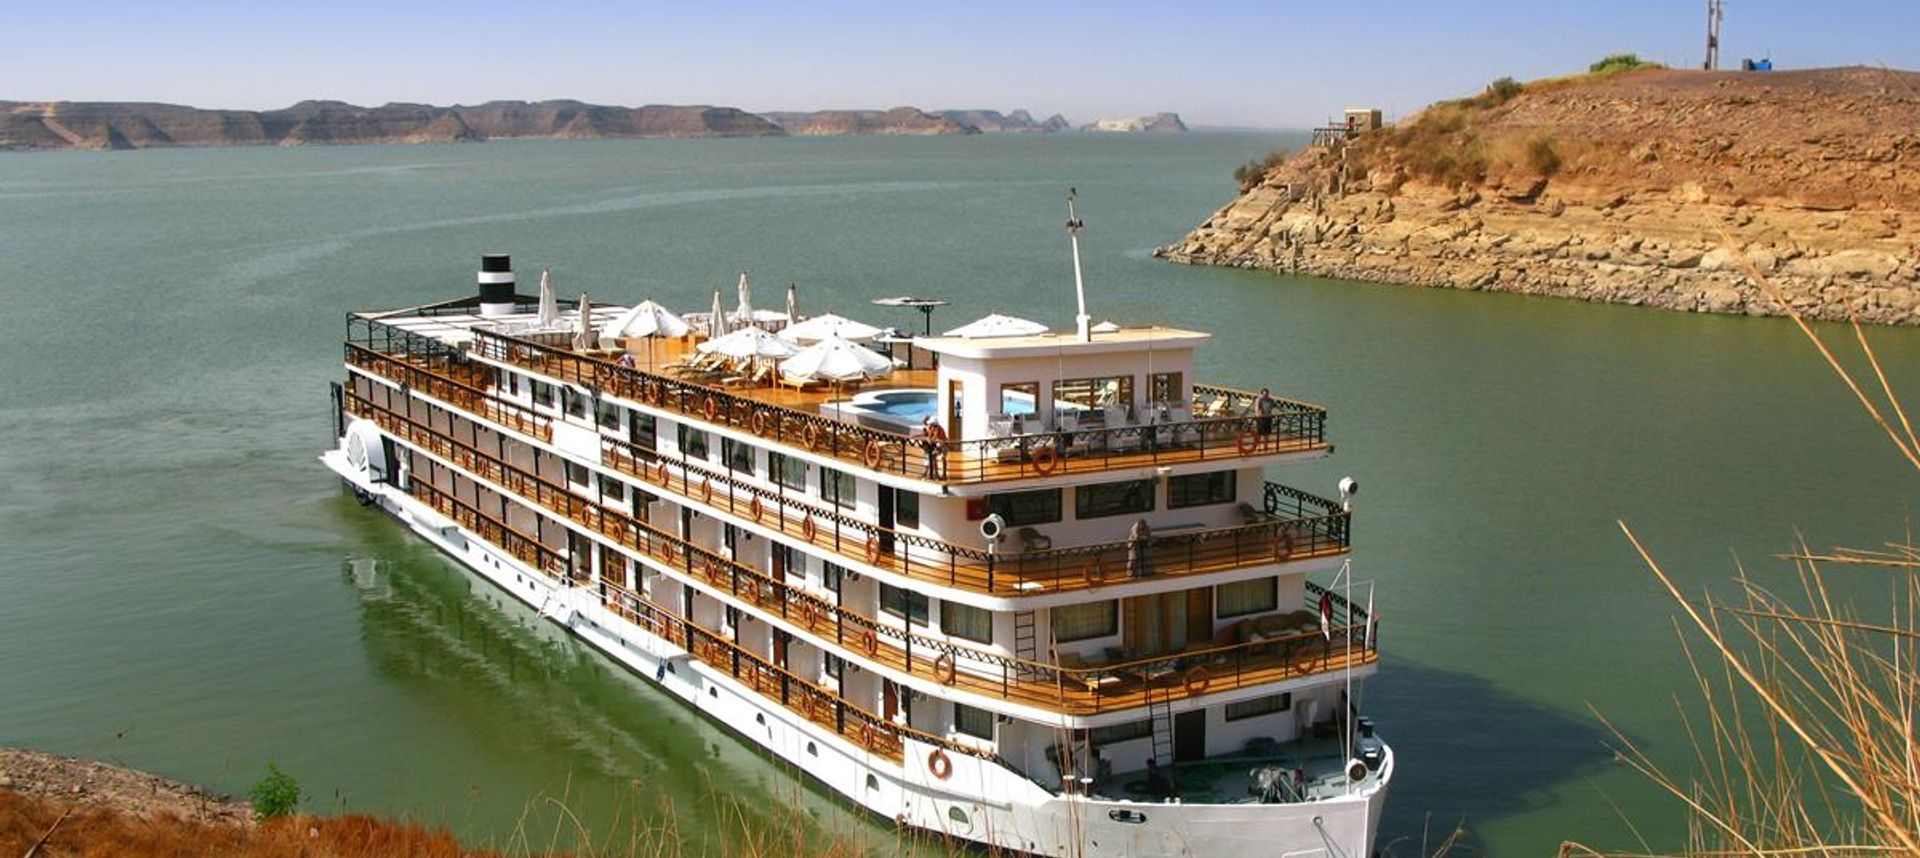 Cruising the Nile in Egypt (Bales Worldwide)